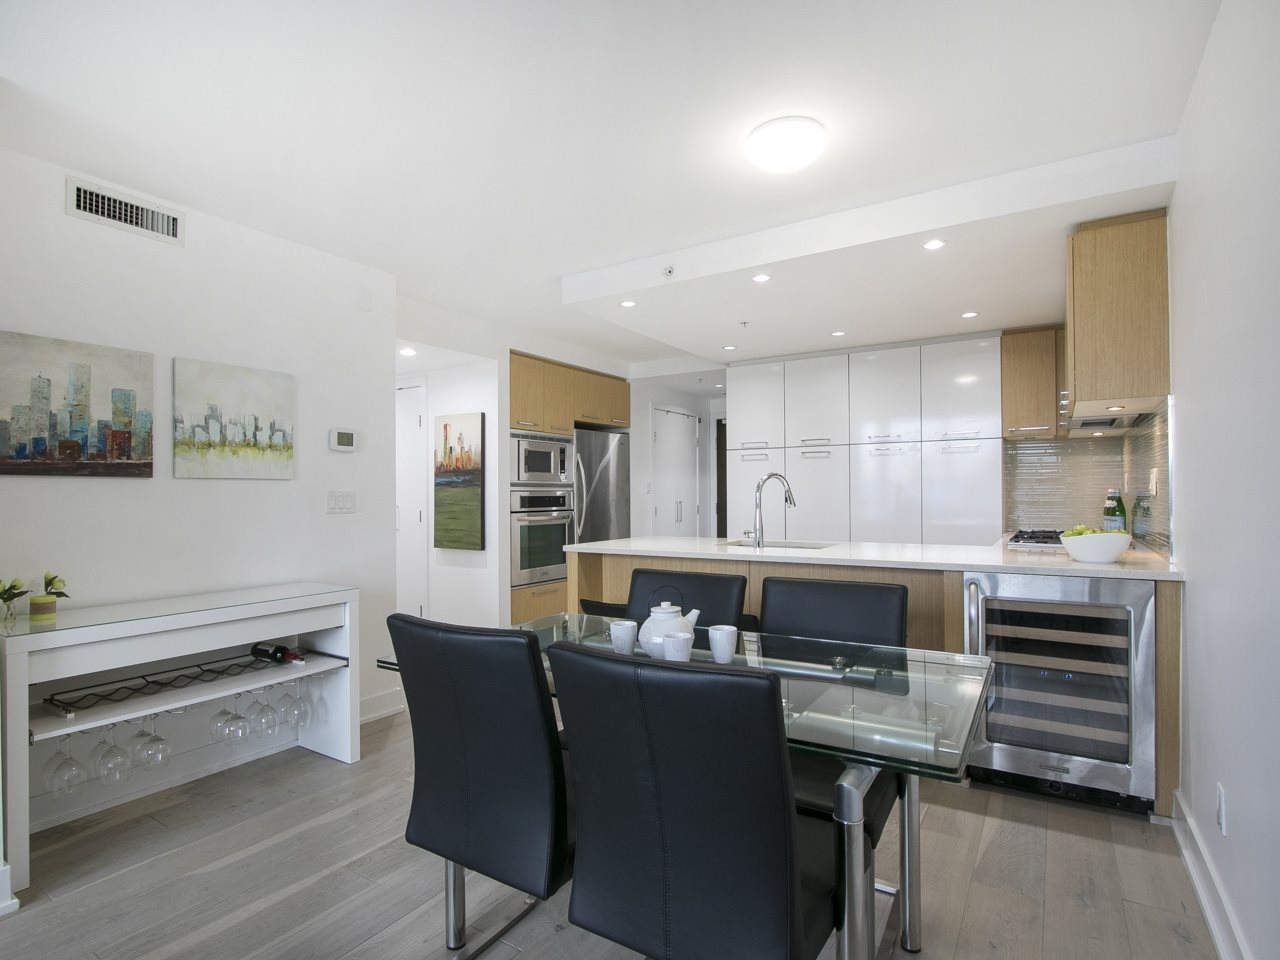 Condo Apartment at 310 1680 W 4TH AVENUE, Unit 310, Vancouver West, British Columbia. Image 1